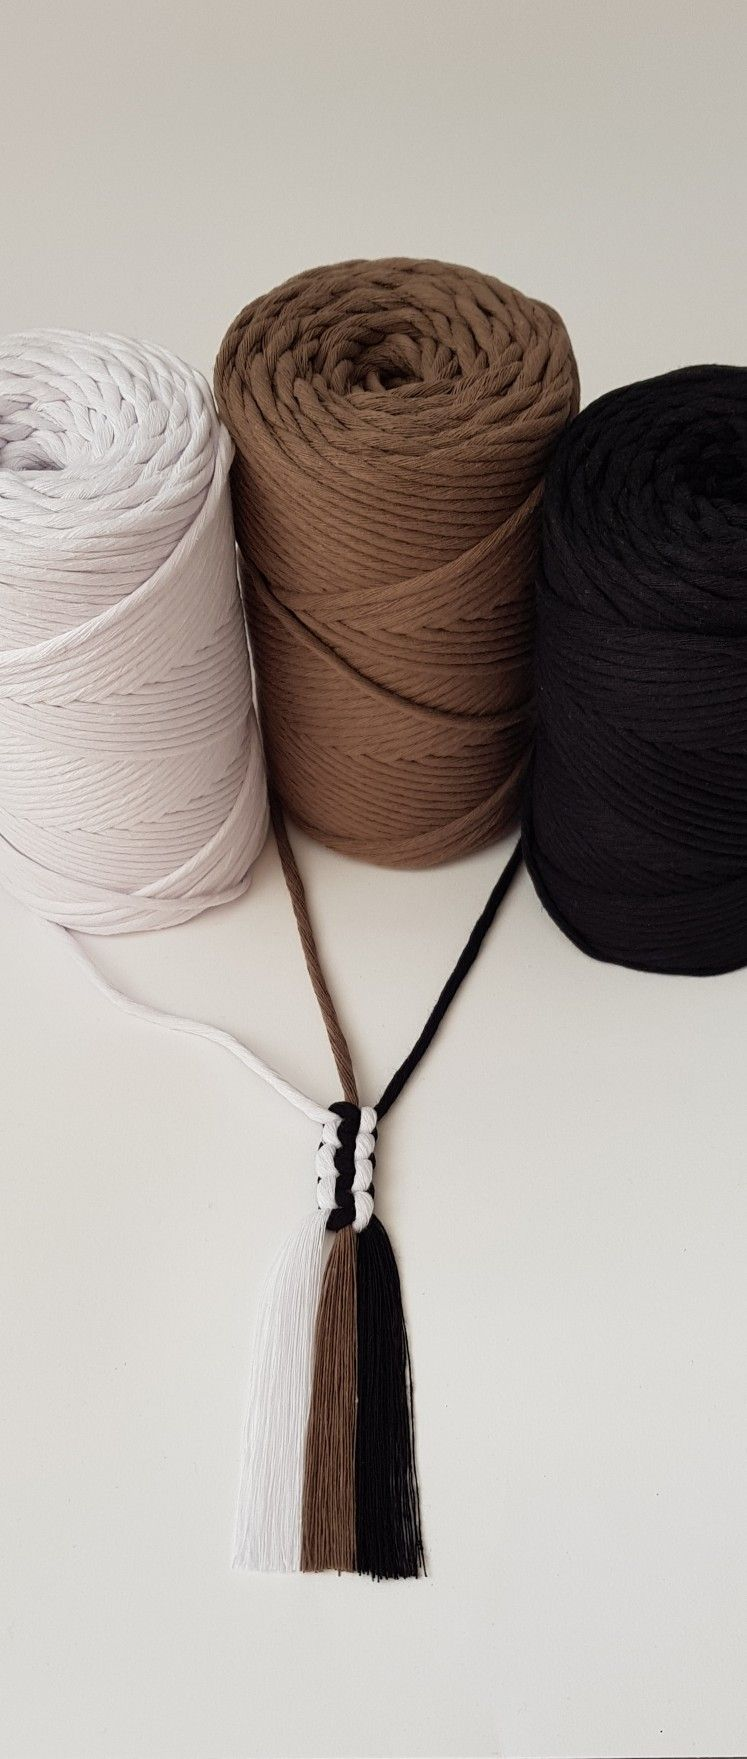 Single Strand Cotton Cord 4mm Macrame Rope 180m Single Strand Macrame Cord 590 Feet Bulk Cotton Fiber Rope 196 Yard Diy Crafts Rope Macrame Cord Cotton Crafts Macrame